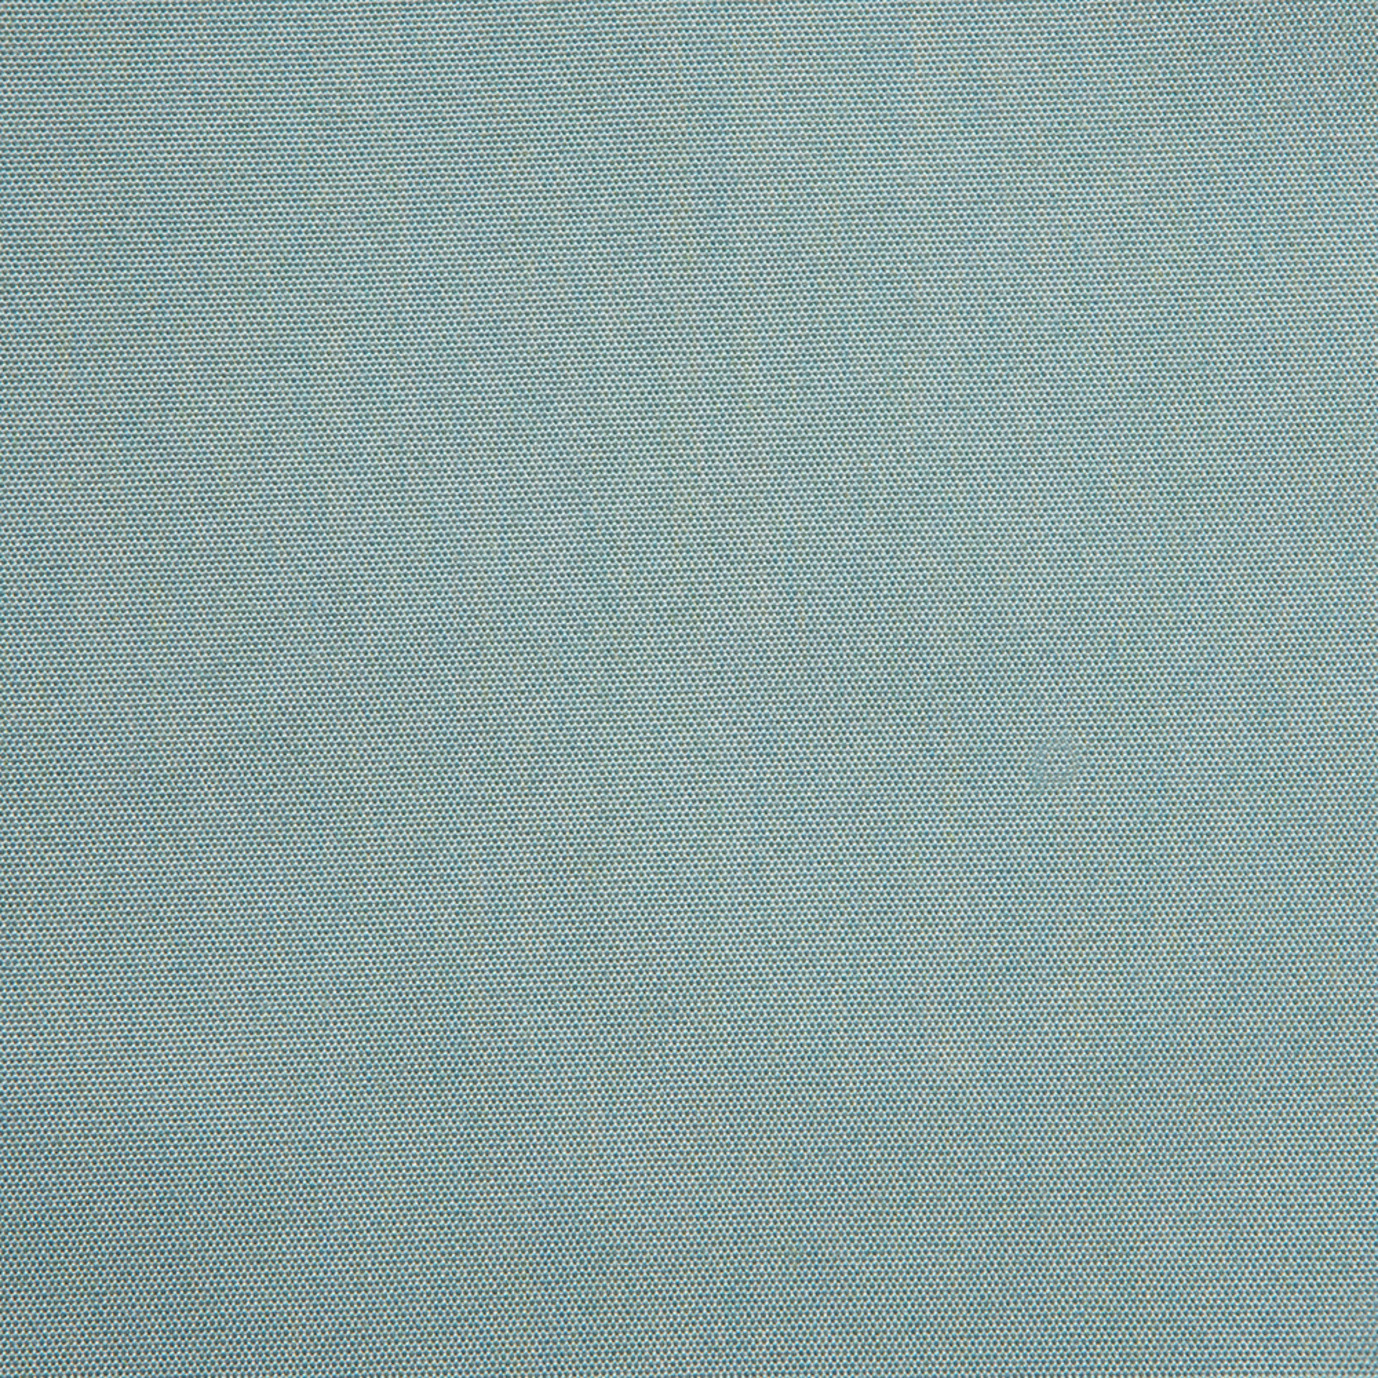 Deco™ 5pc Fire Chat Set- Bliss Blue